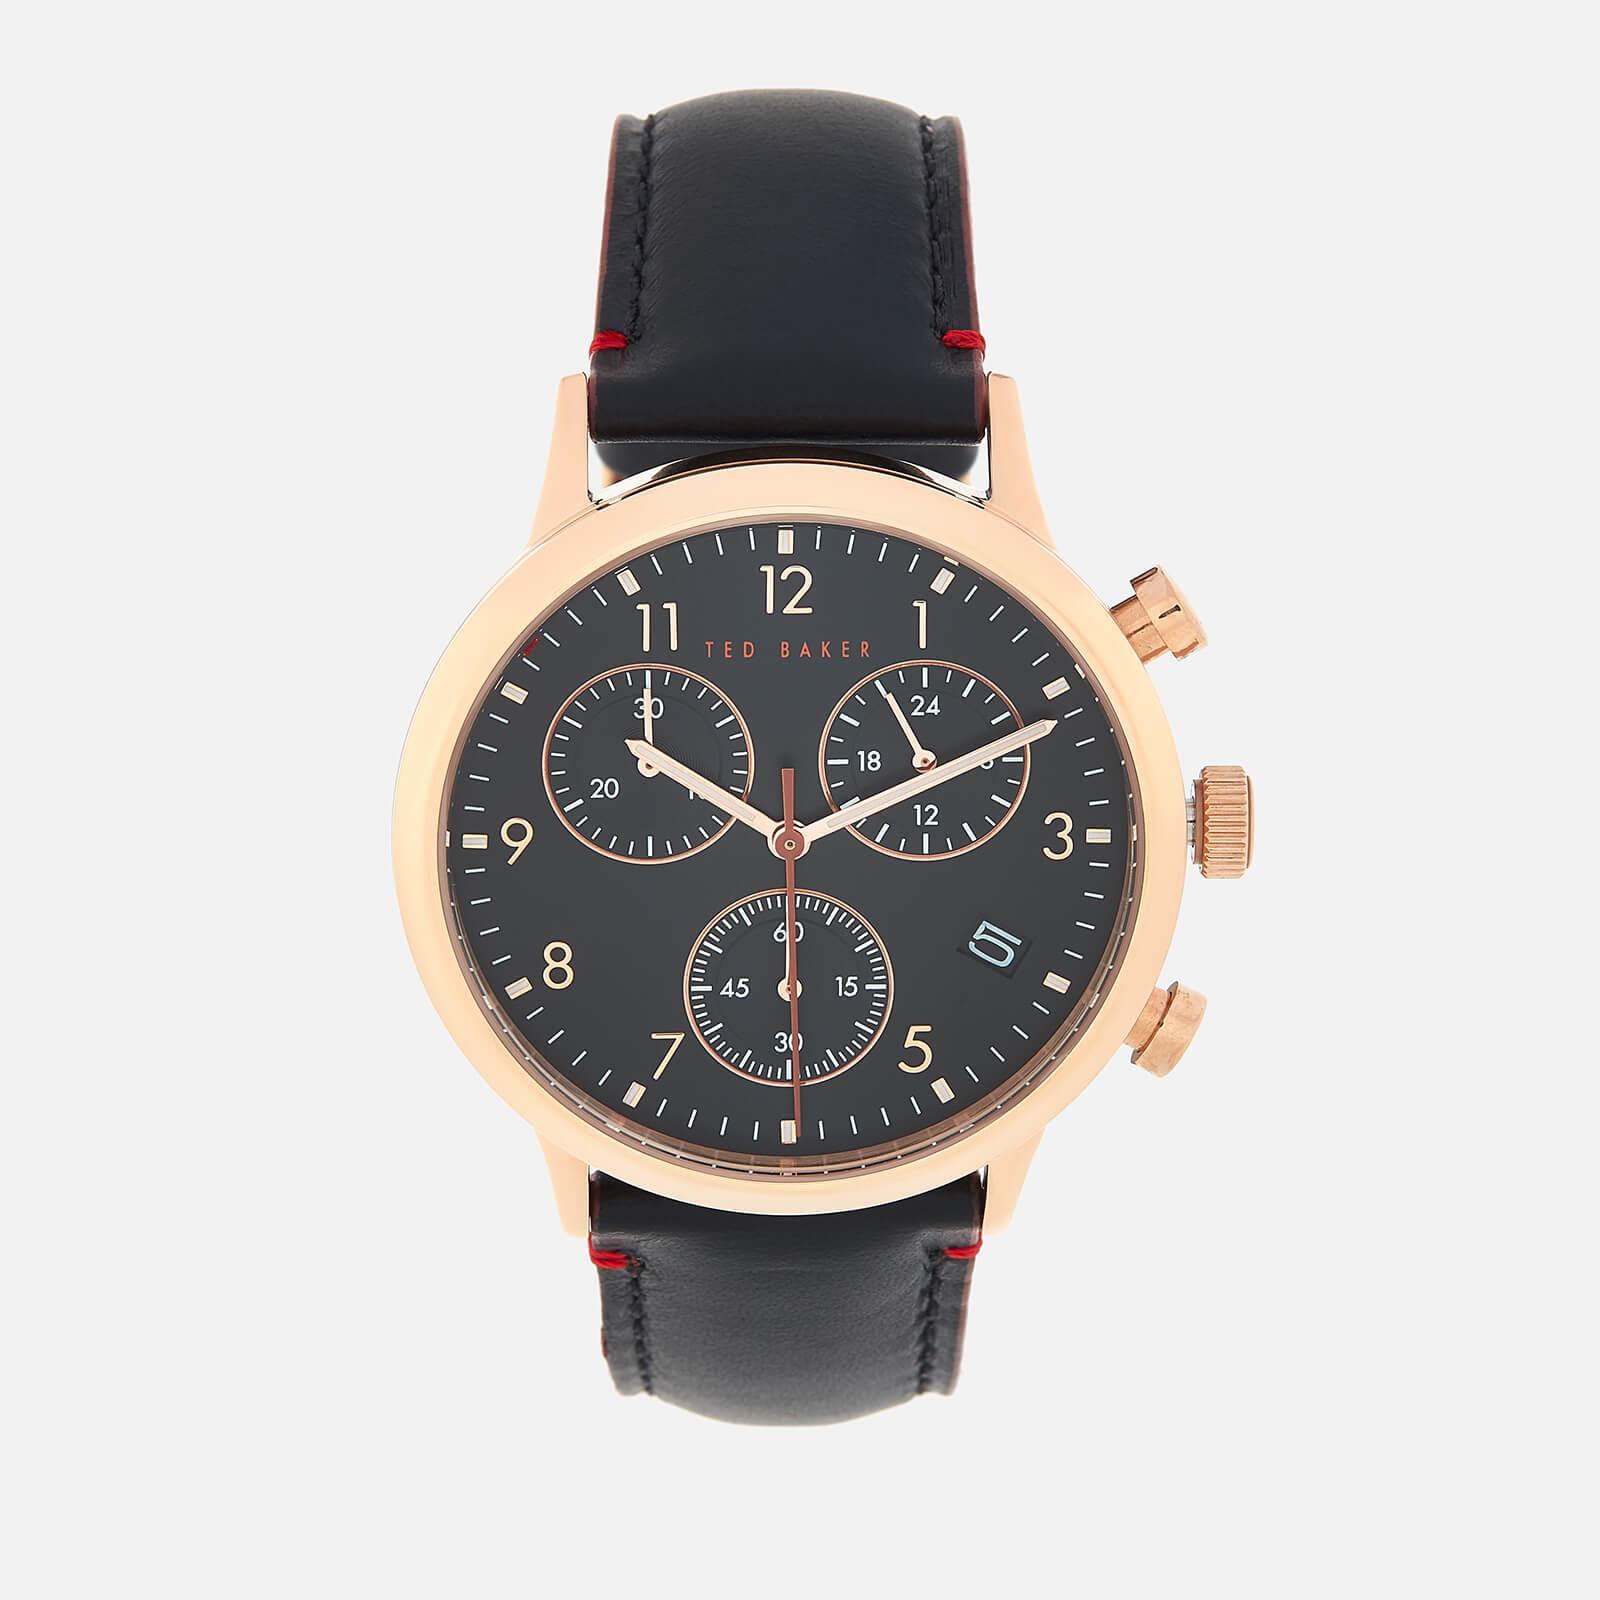 Ted Baker Men's Cosmop Chrono Watch - Black